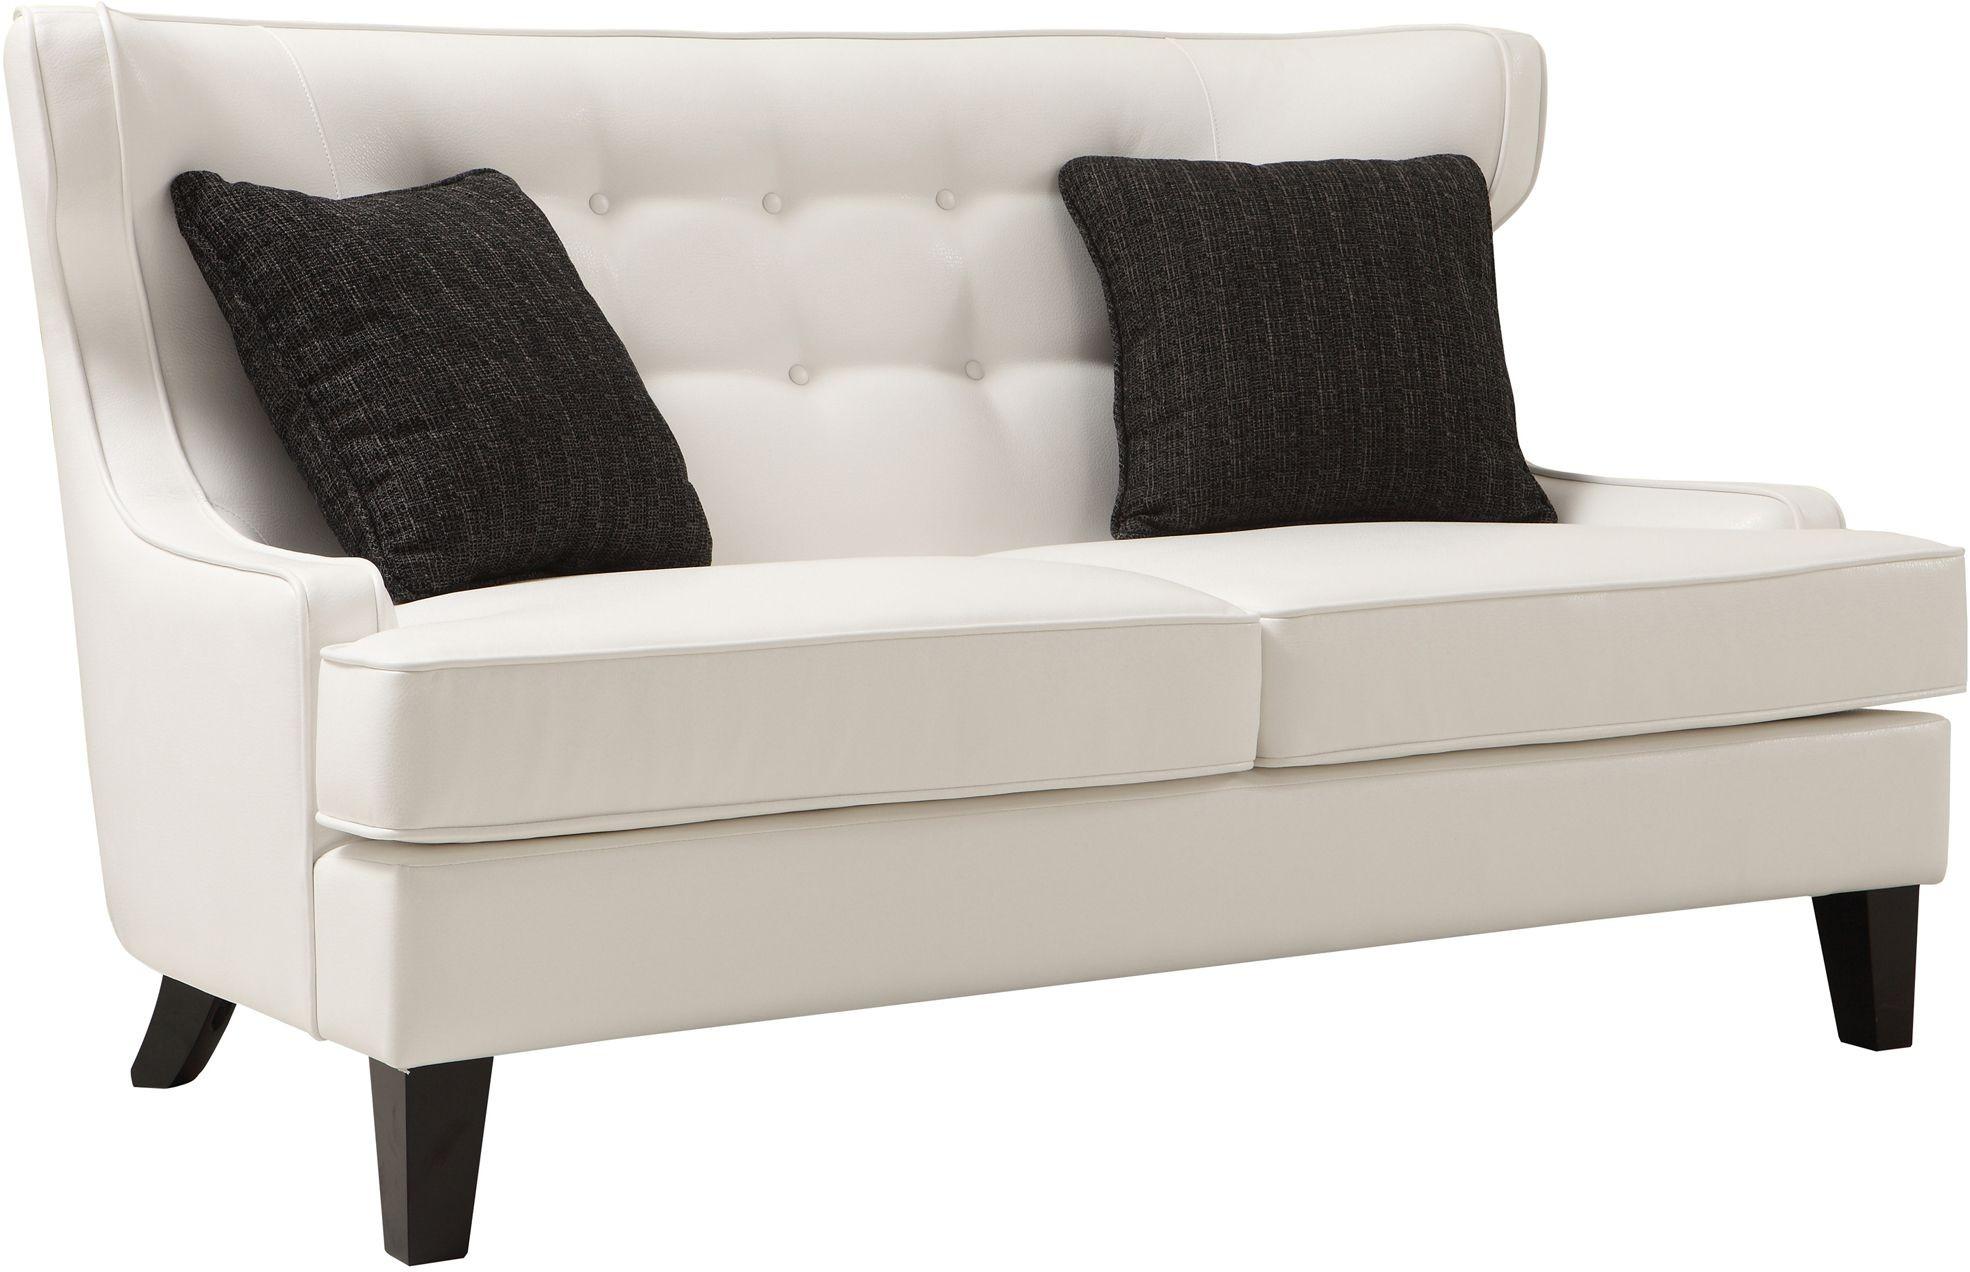 Skyline White Bonded Leather Loveseat From Armen Living Coleman Furniture